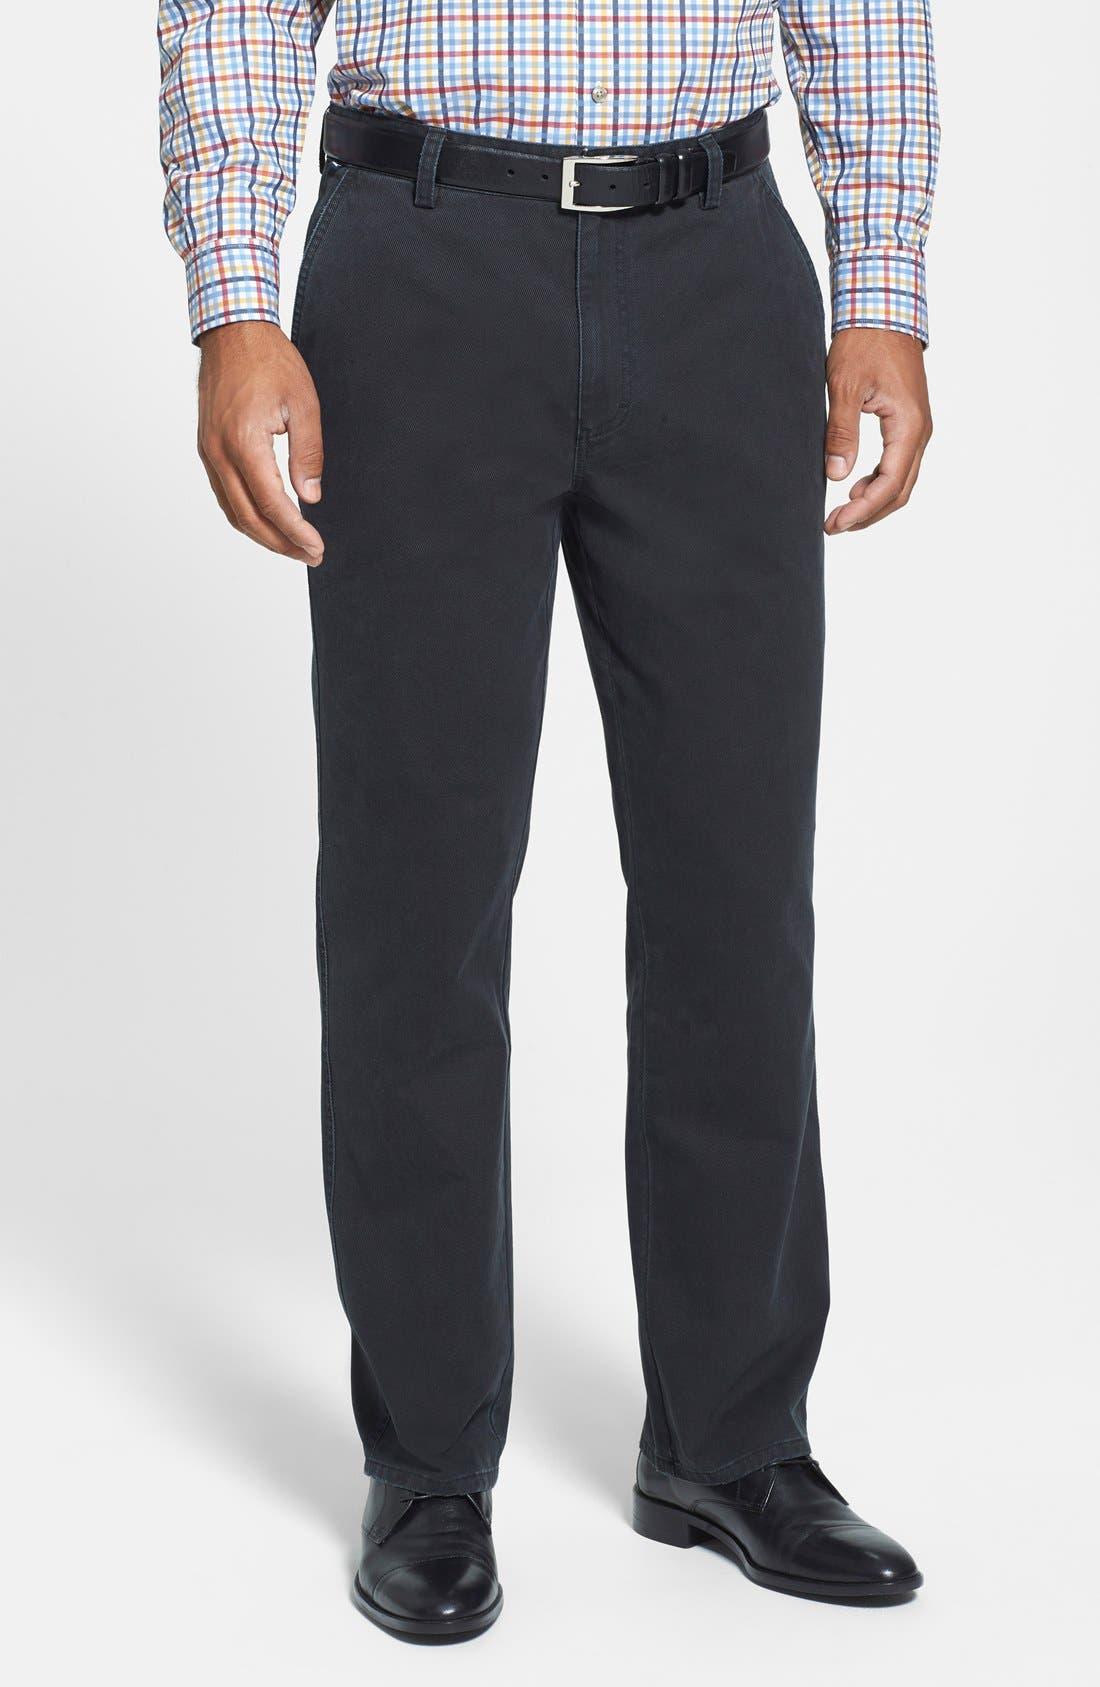 Curtis Flat Front Five-Pocket Cotton Twill Pants,                             Main thumbnail 1, color,                             BLACK